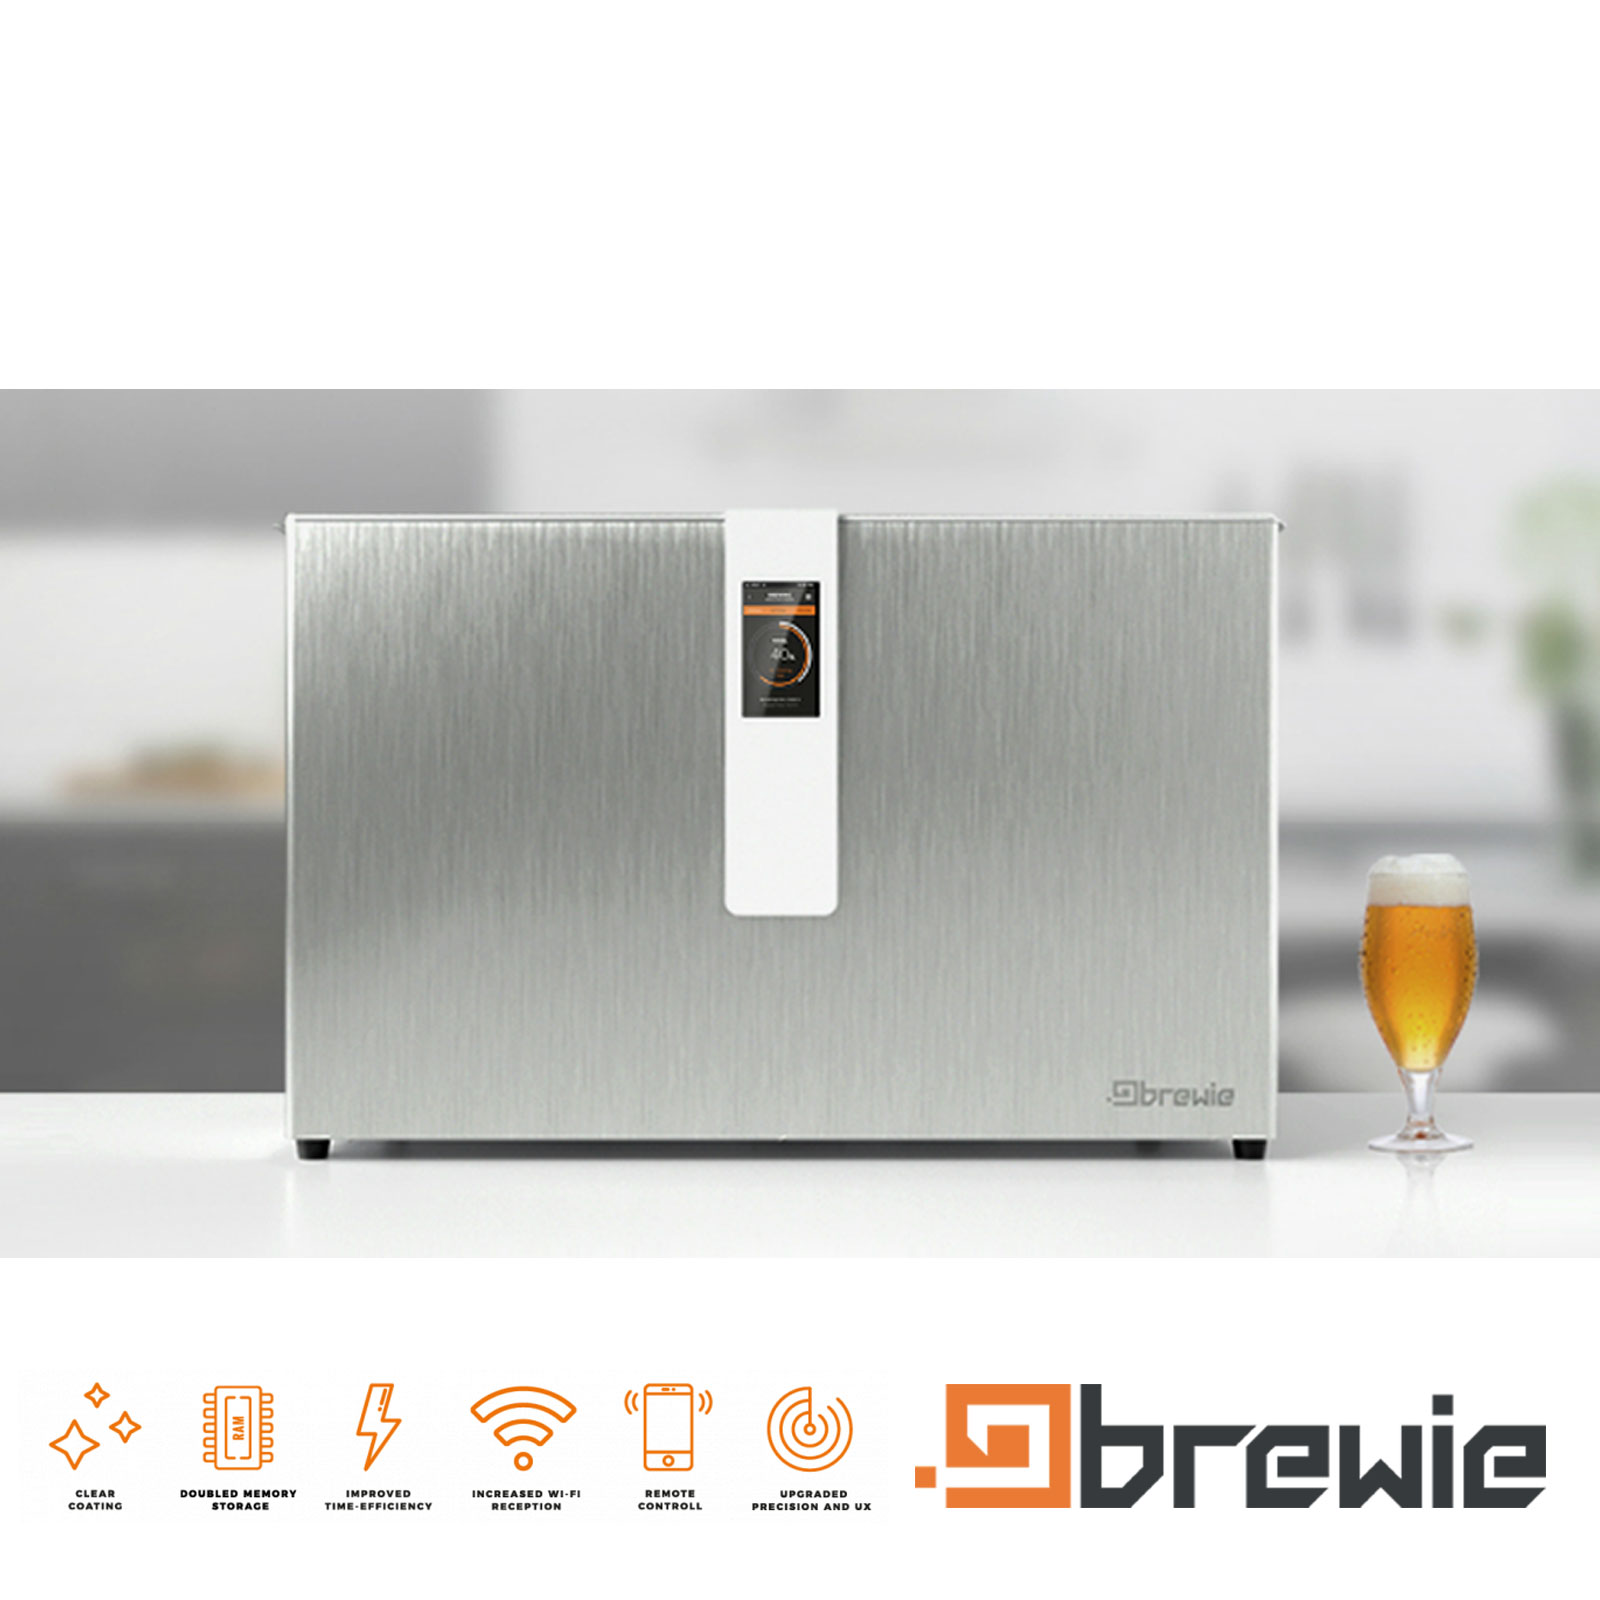 Impianto Brewie + All in one LAST VERSION